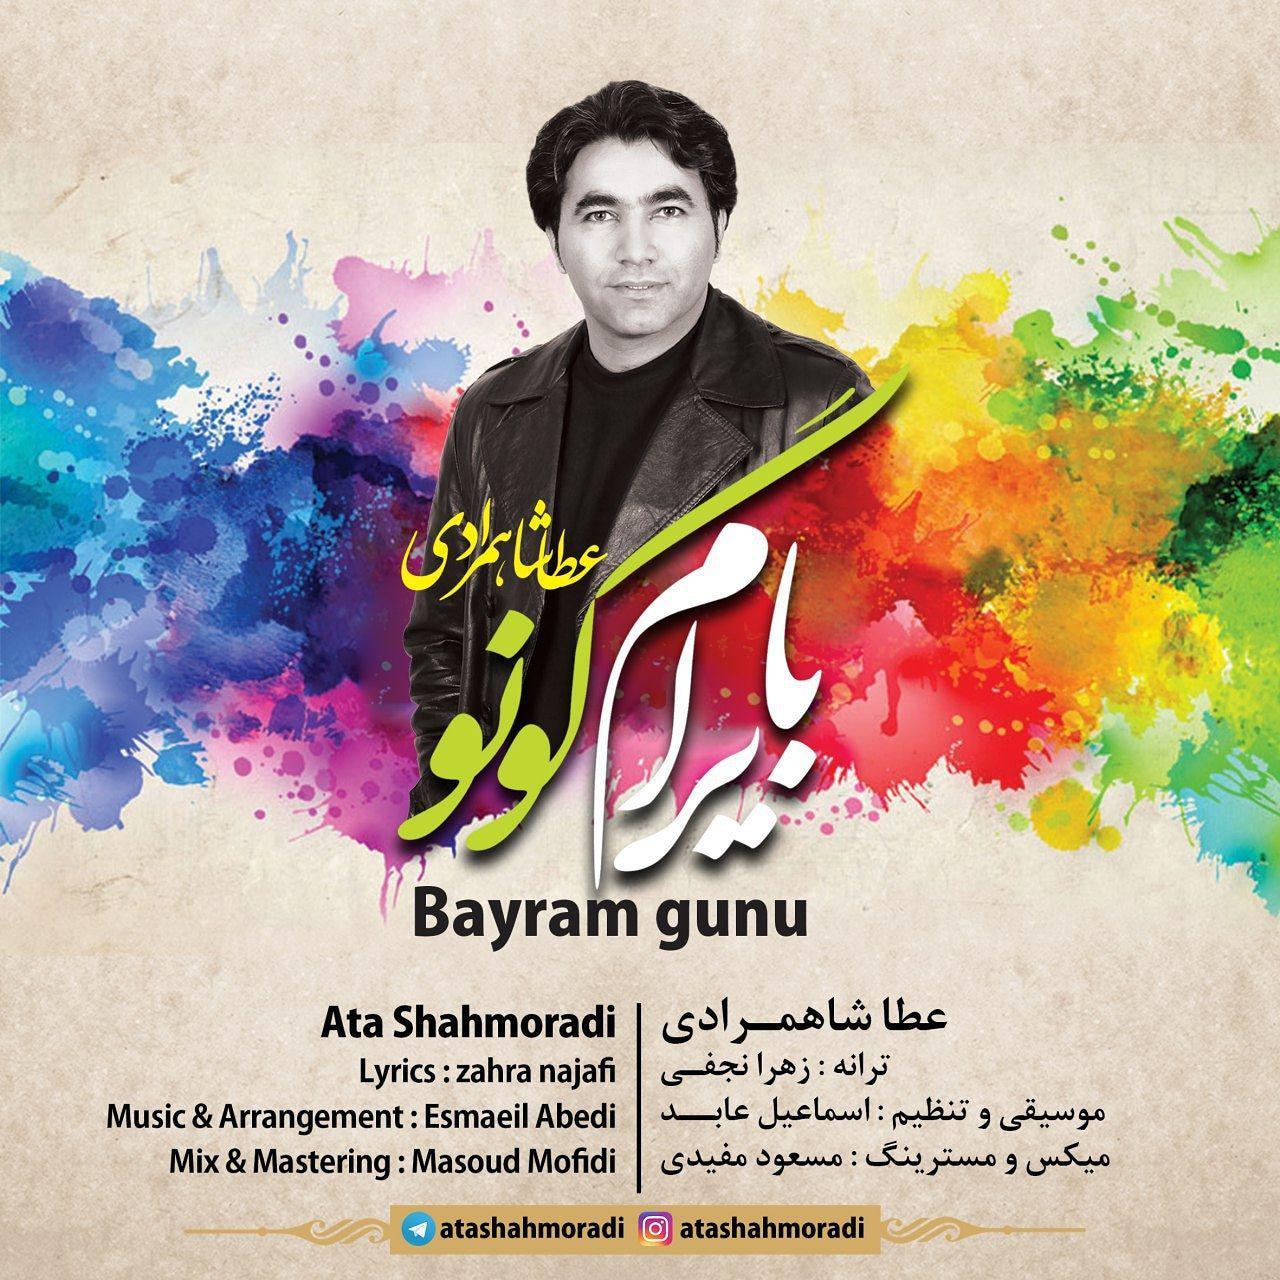 http://s9.picofile.com/file/8325409900/01Ata_Shahmoradi_Bayram_Gunu.jpg